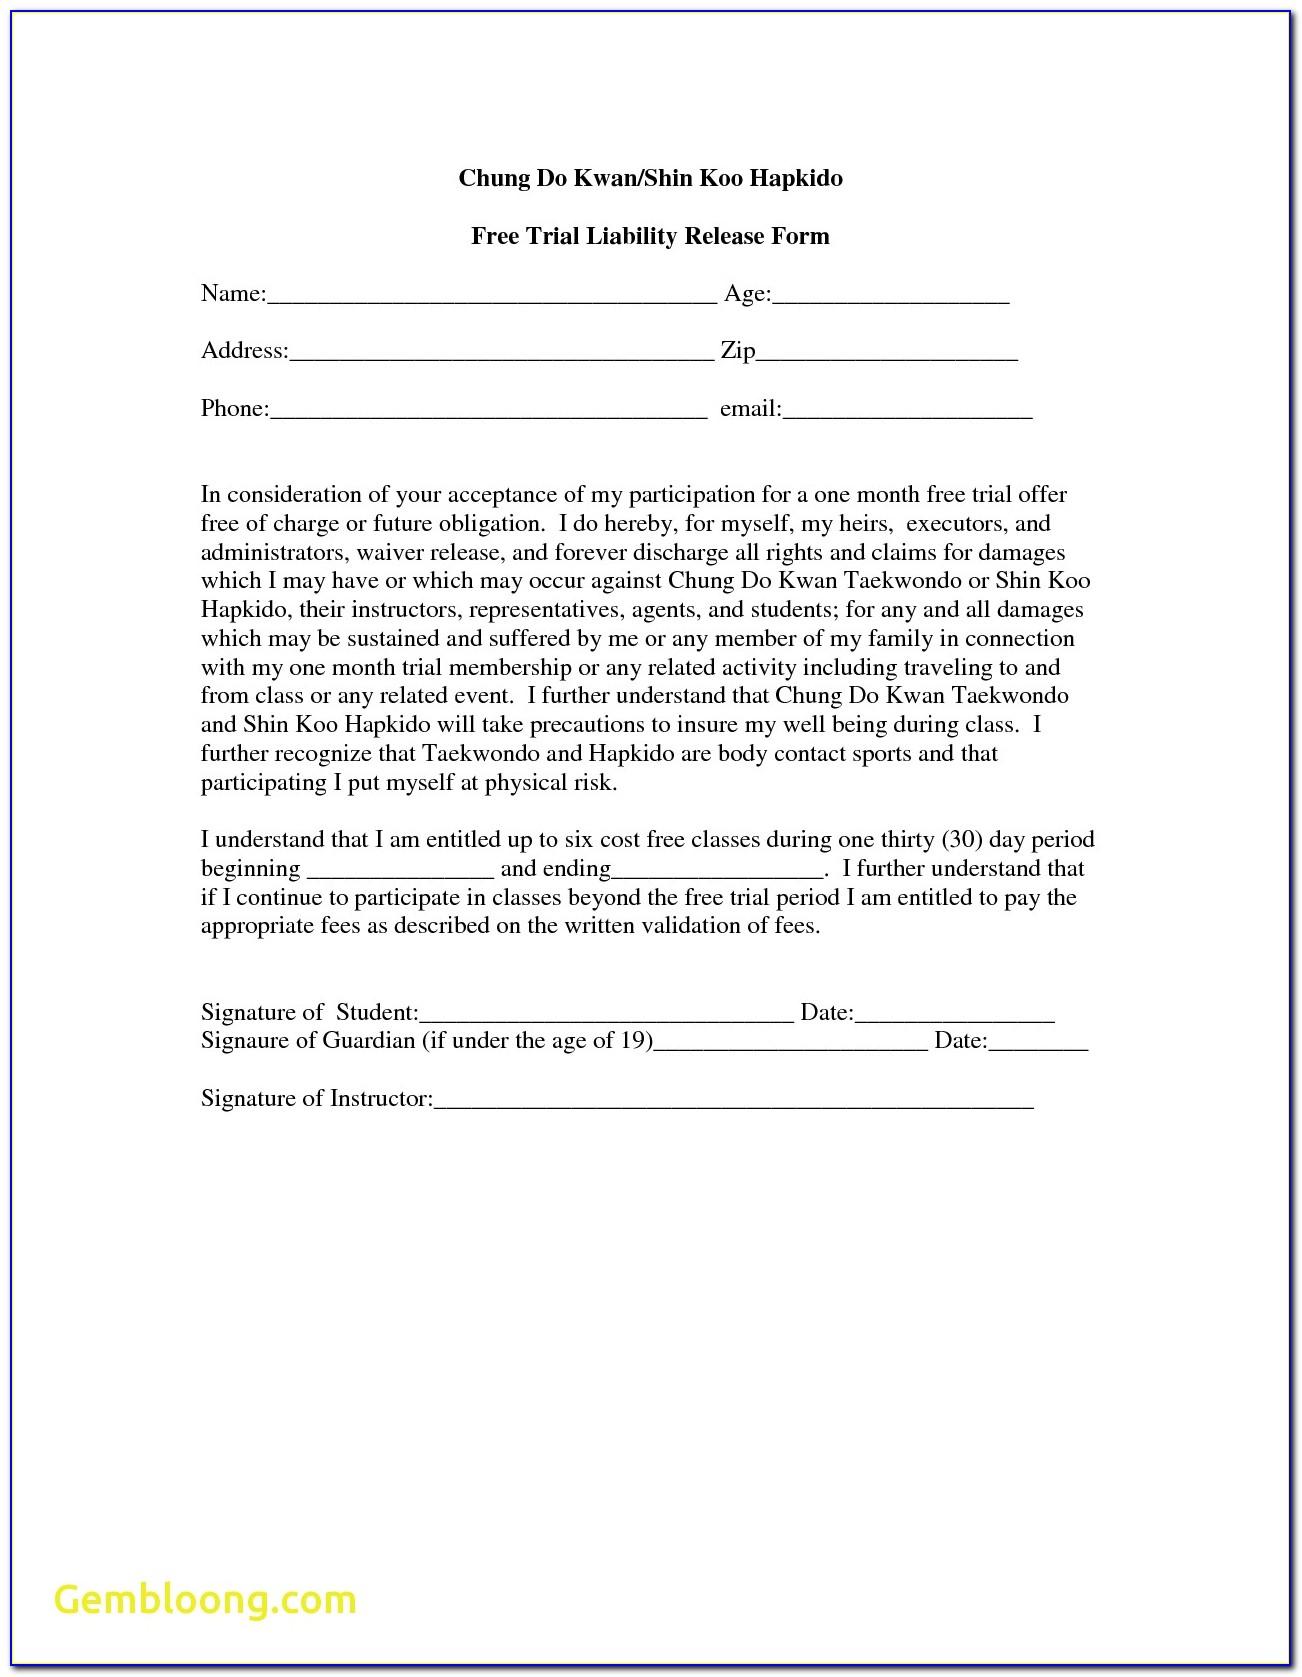 Free Liability Waiver Form Australia